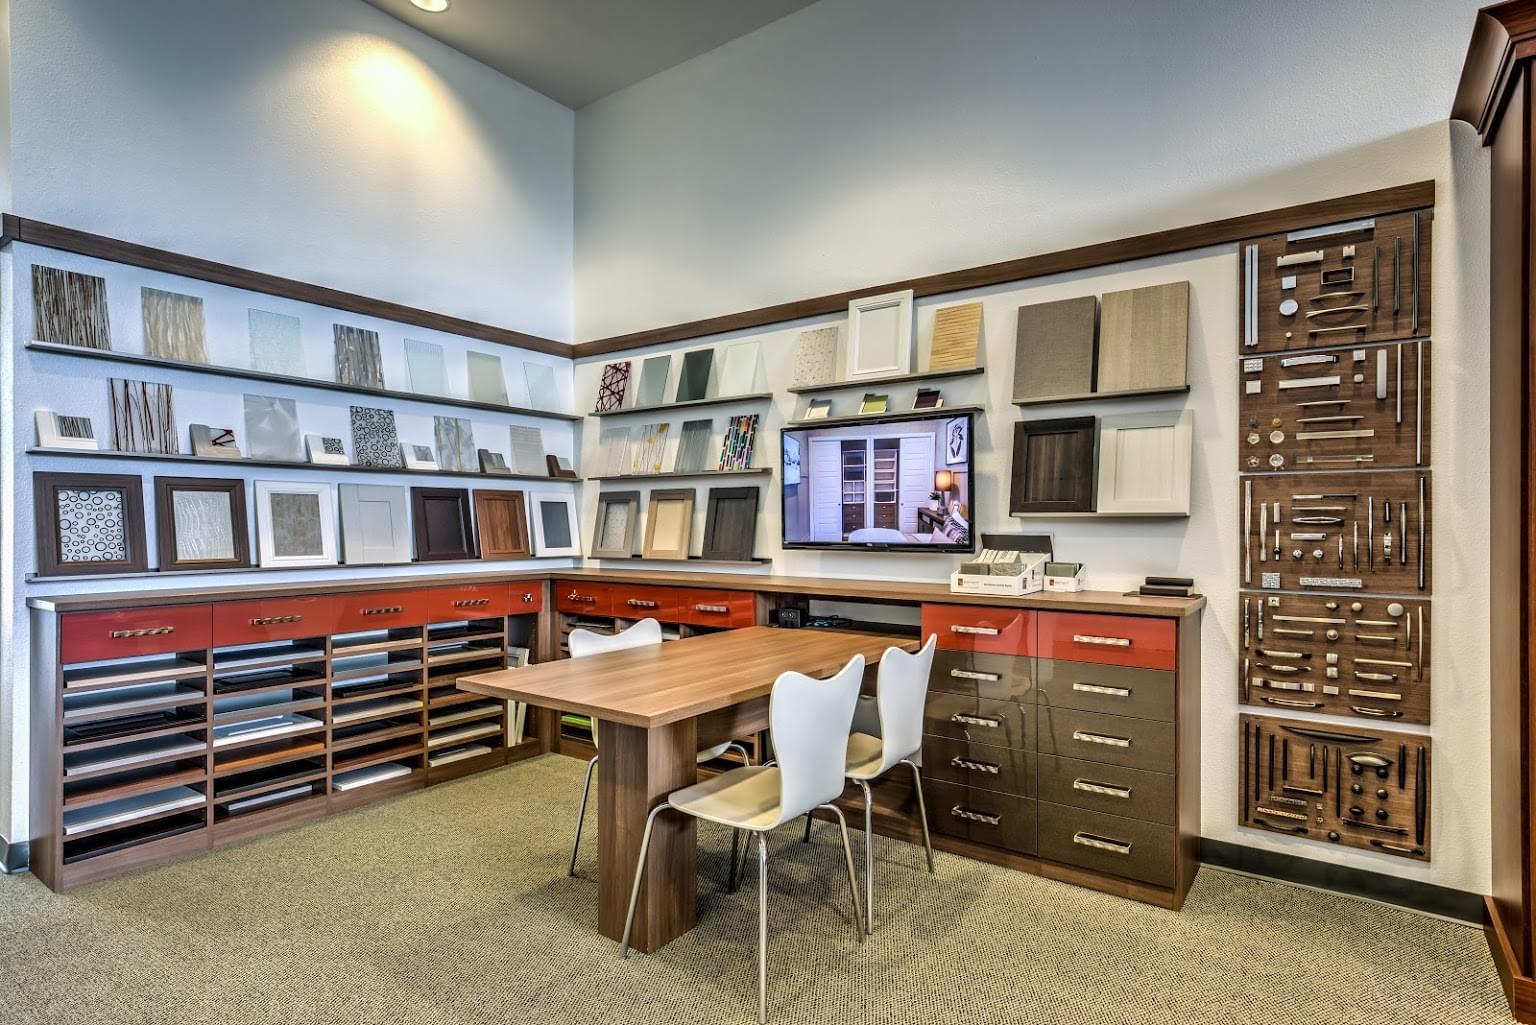 California closets las vegas - California Closets Grand Canyon Dr Las Vegas Nv Cabinet Maker Design Center